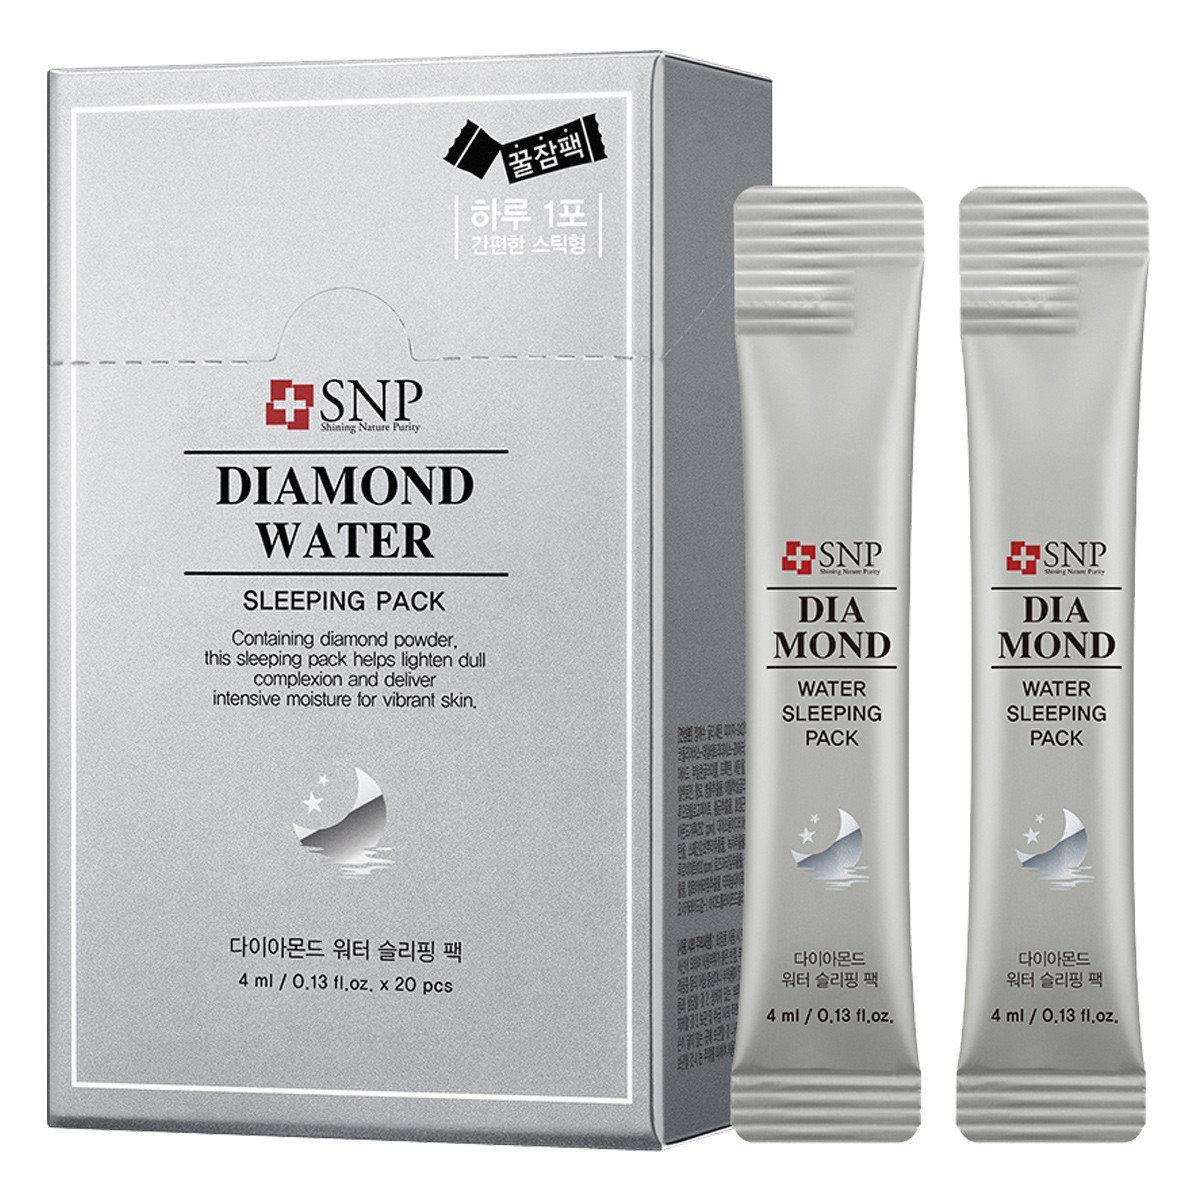 SNP Diamond Water Sleeping Pack (Silver) 愛神菲 鑽石水份睡眠面膜 (銀色) 4ml x 20支 SNP銀盒